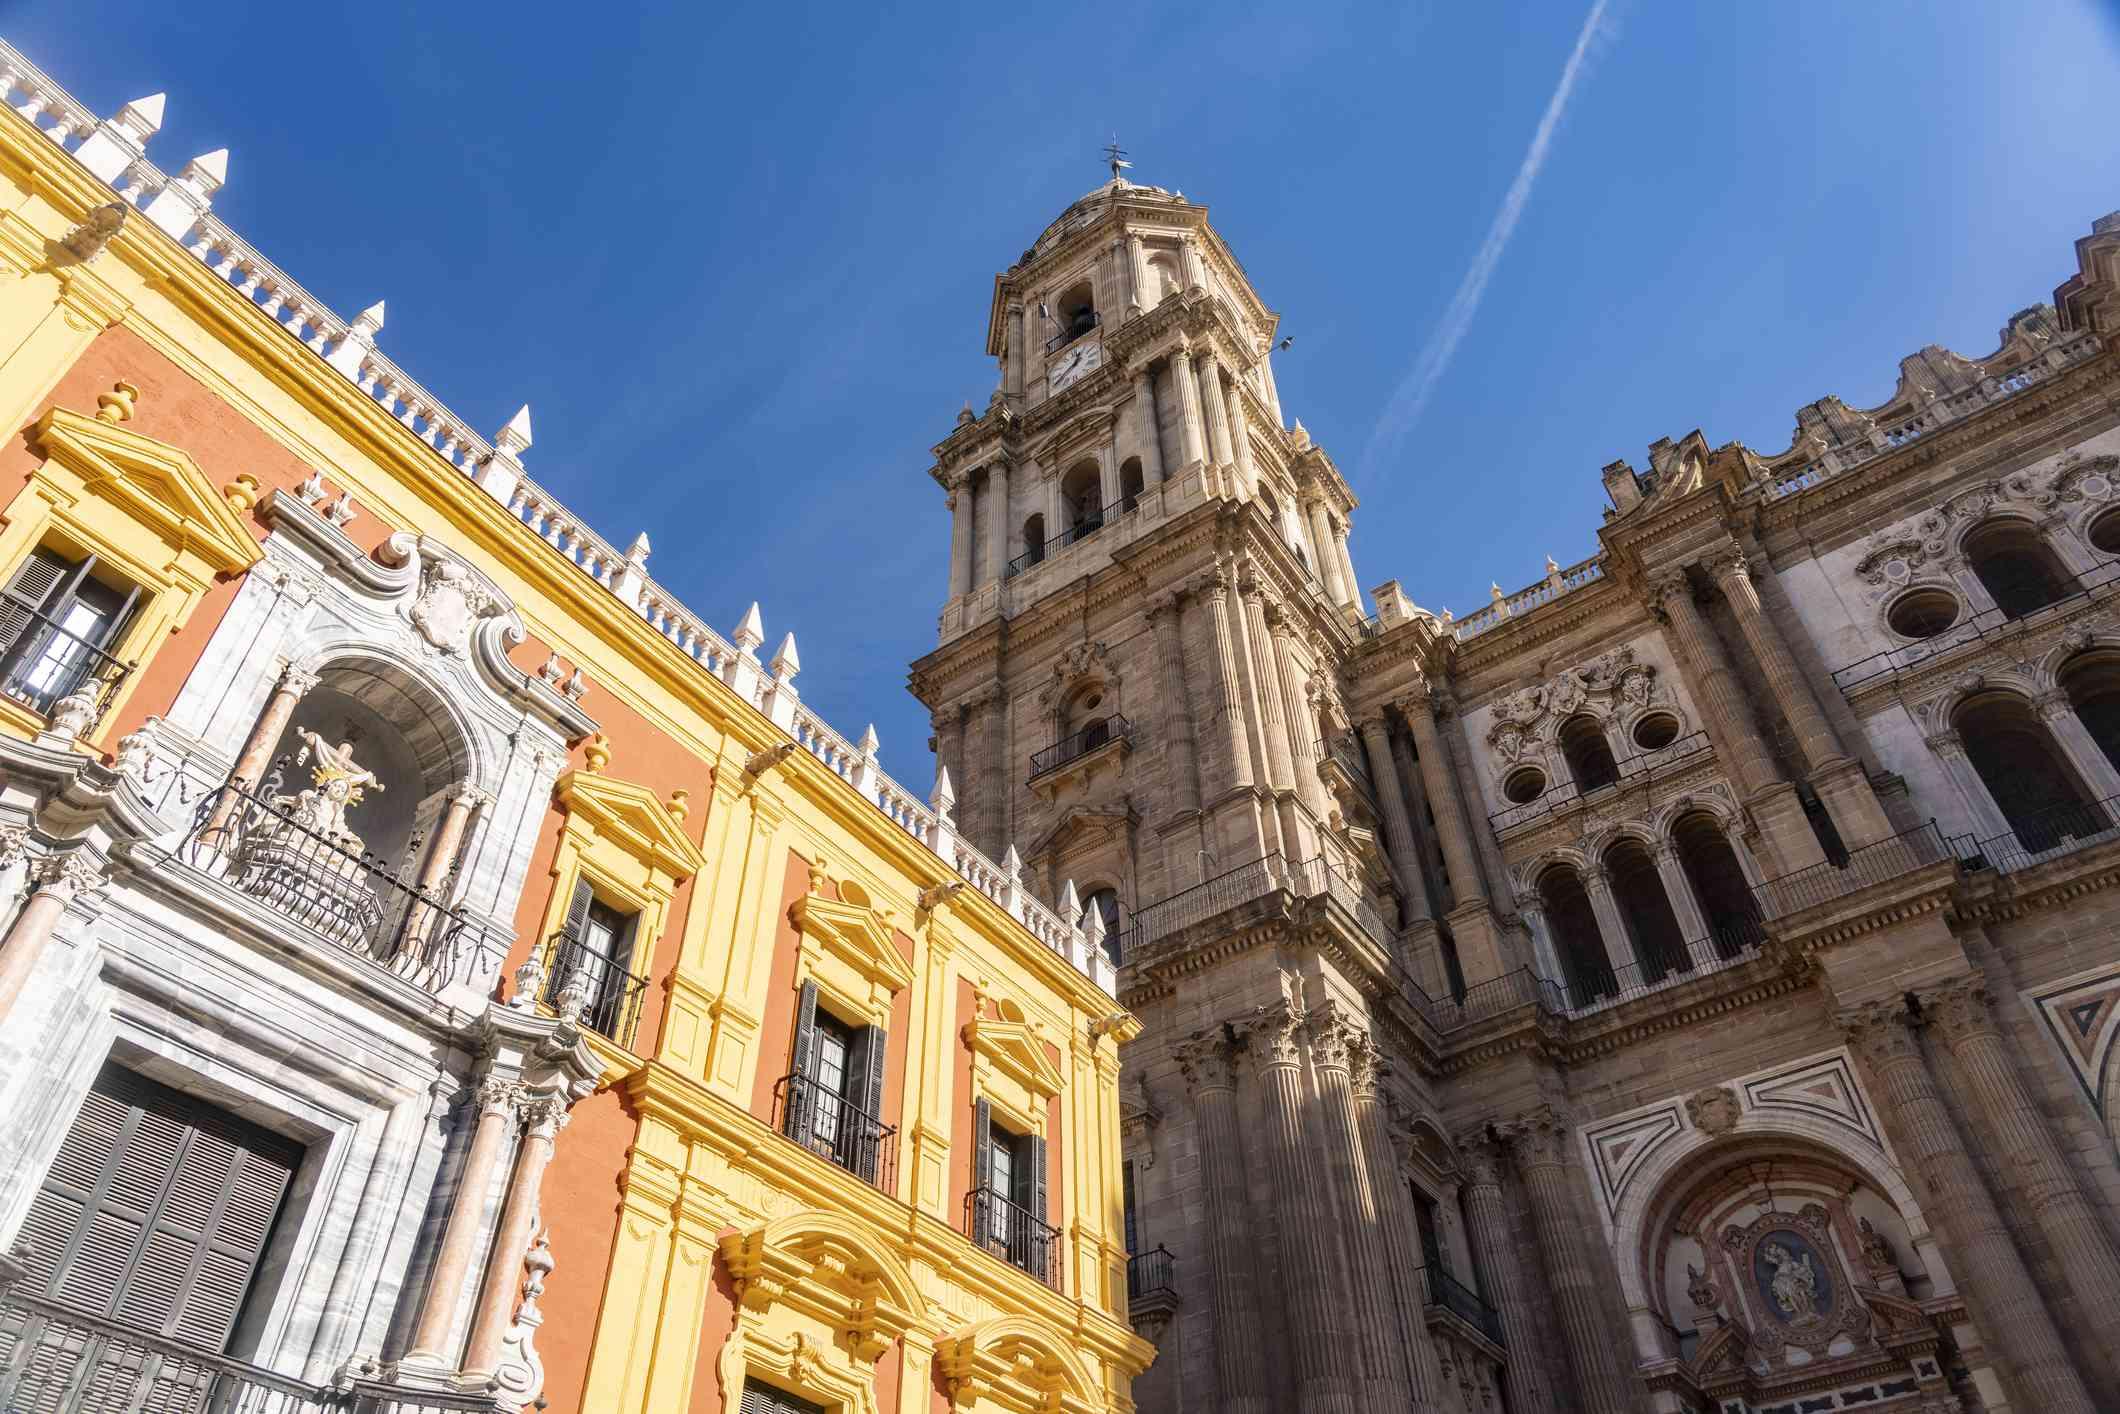 Spain, Malaga, Malaga cathedral